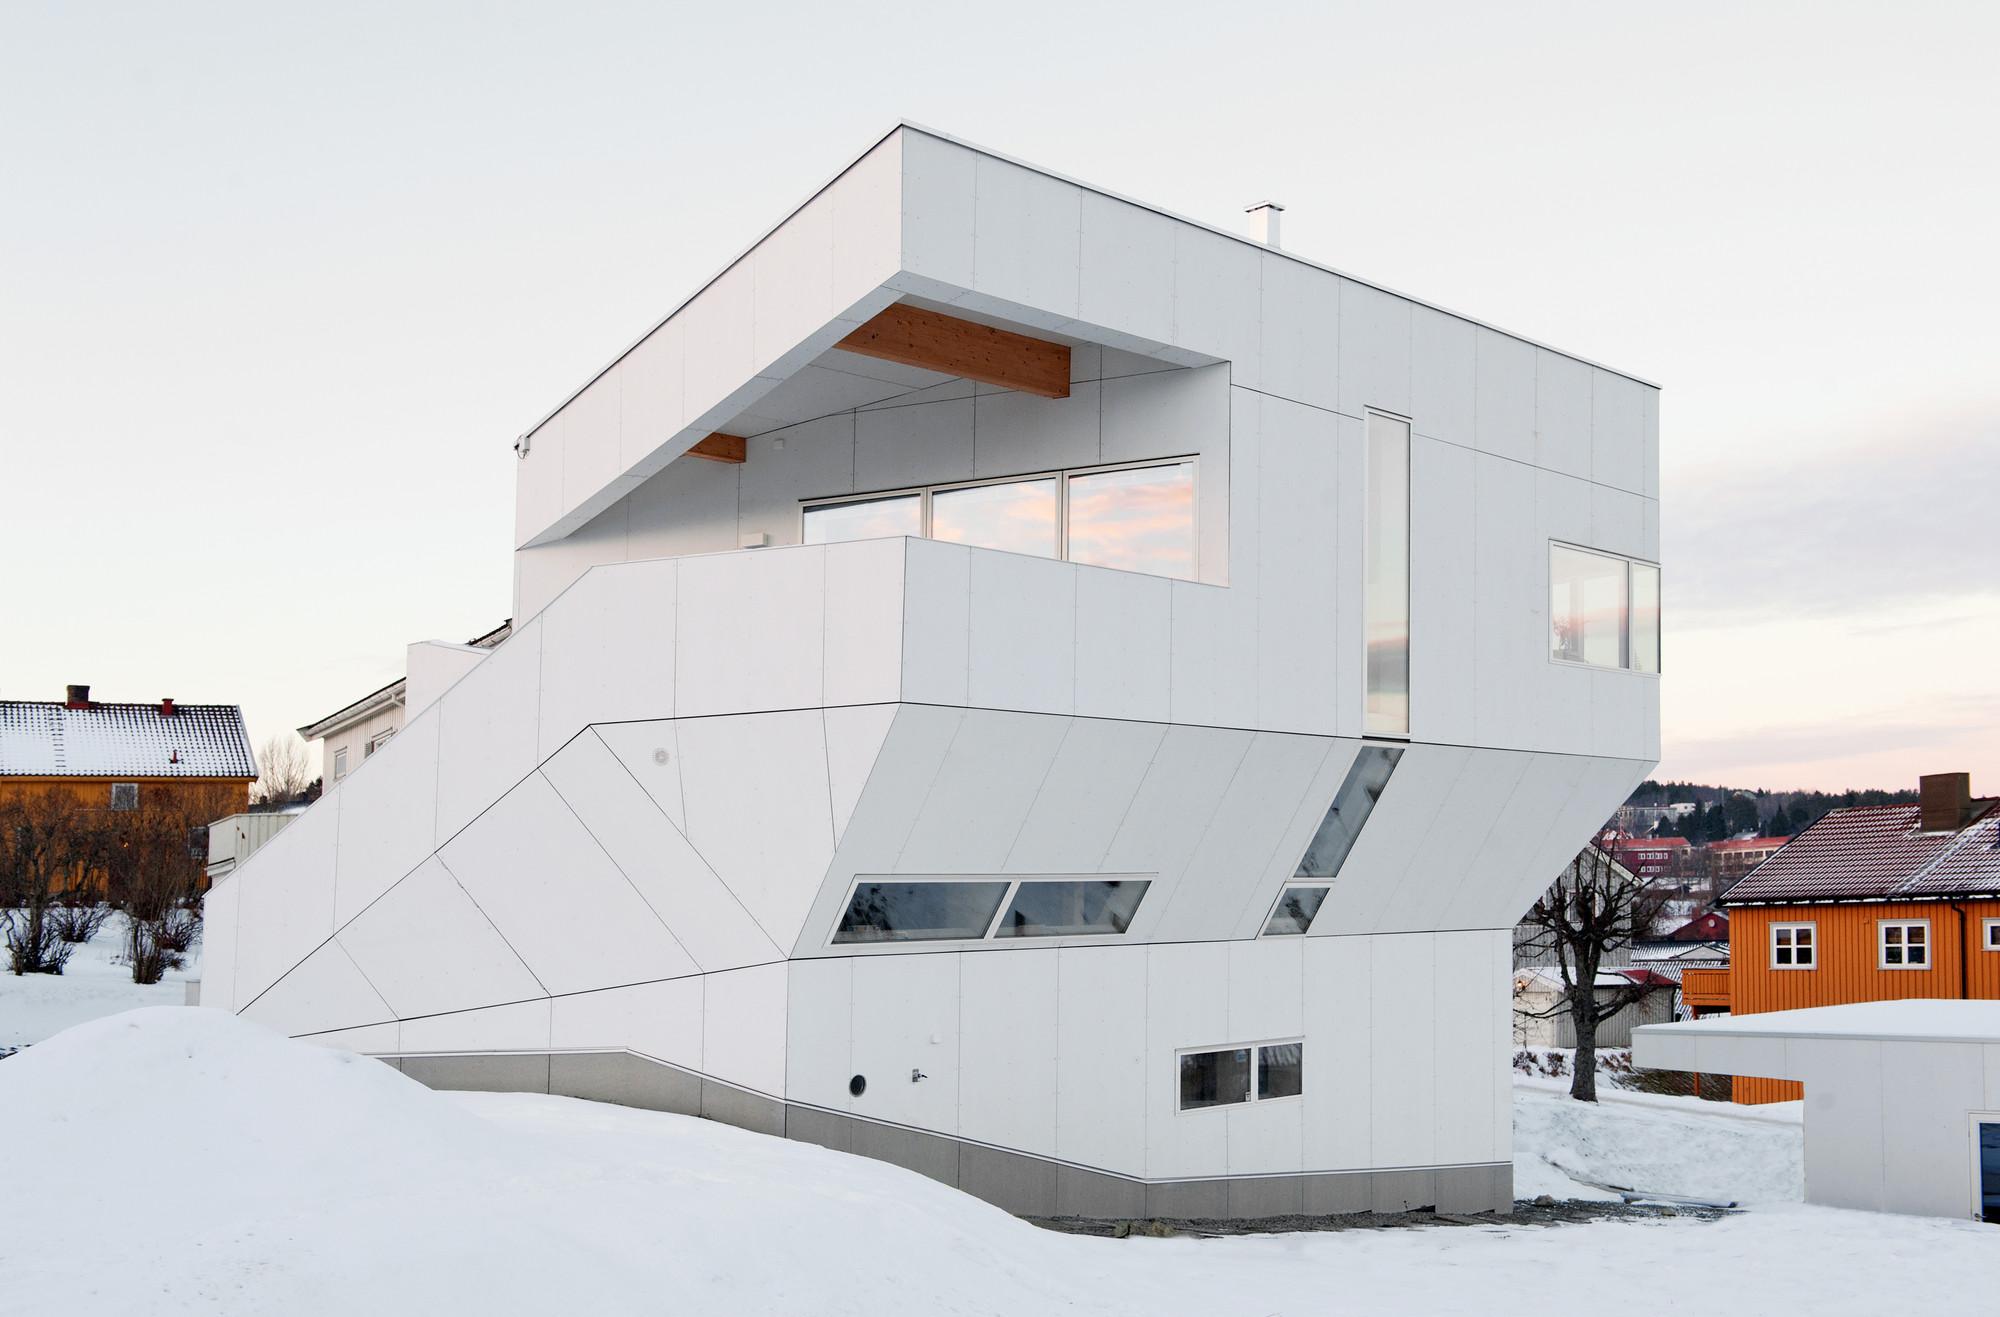 Architects. JVA